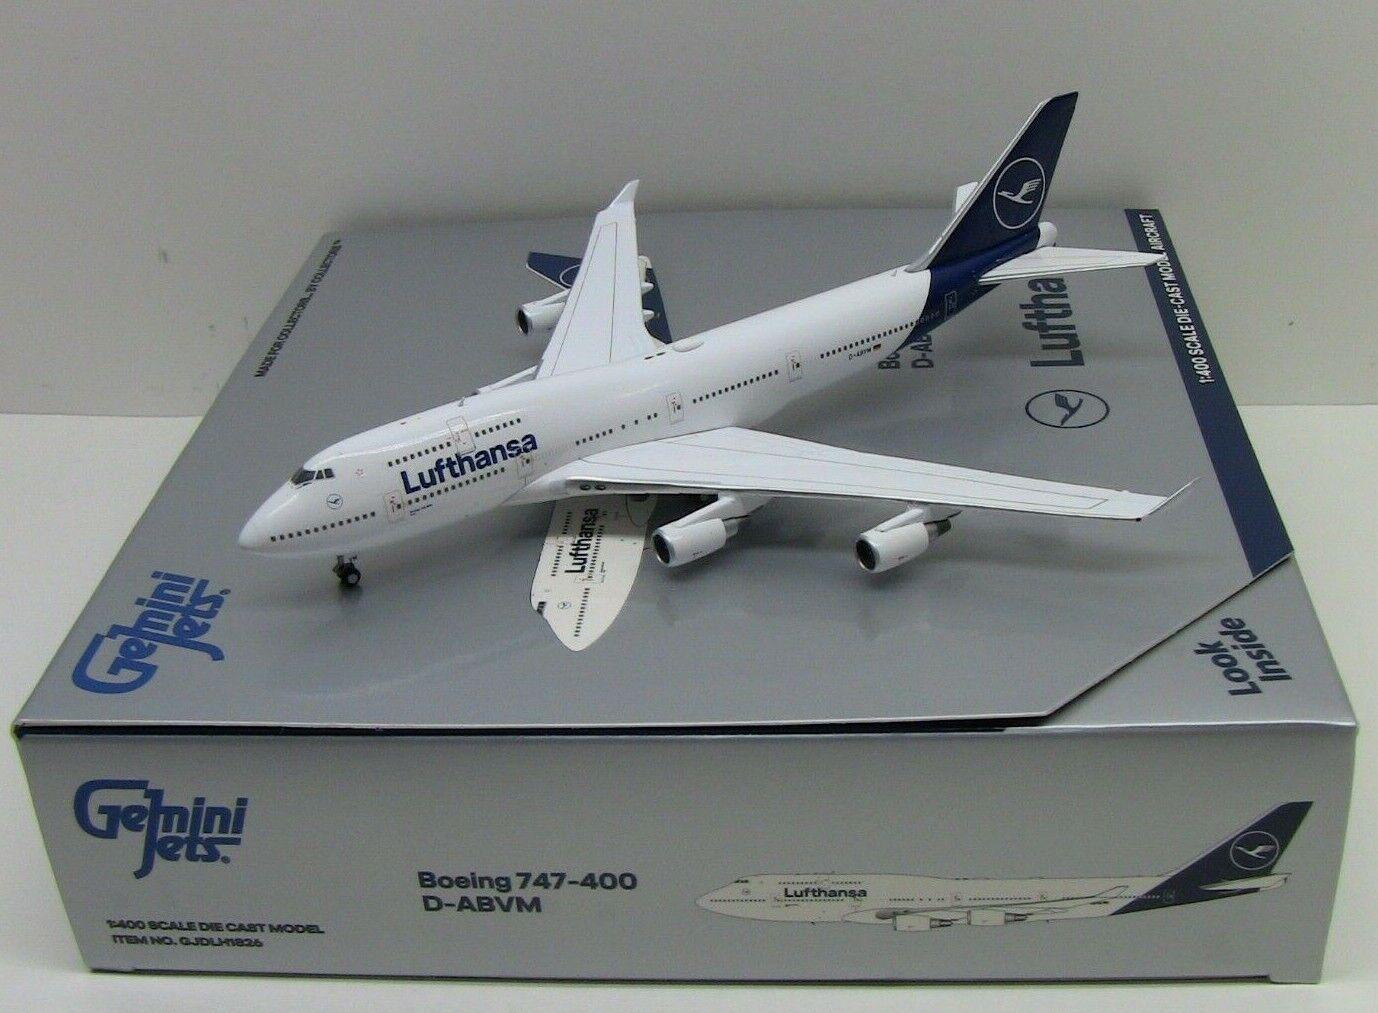 Gemini Jets Lufthansa Boeing 747-400 D-ABVM 1 400 GJDLH1826